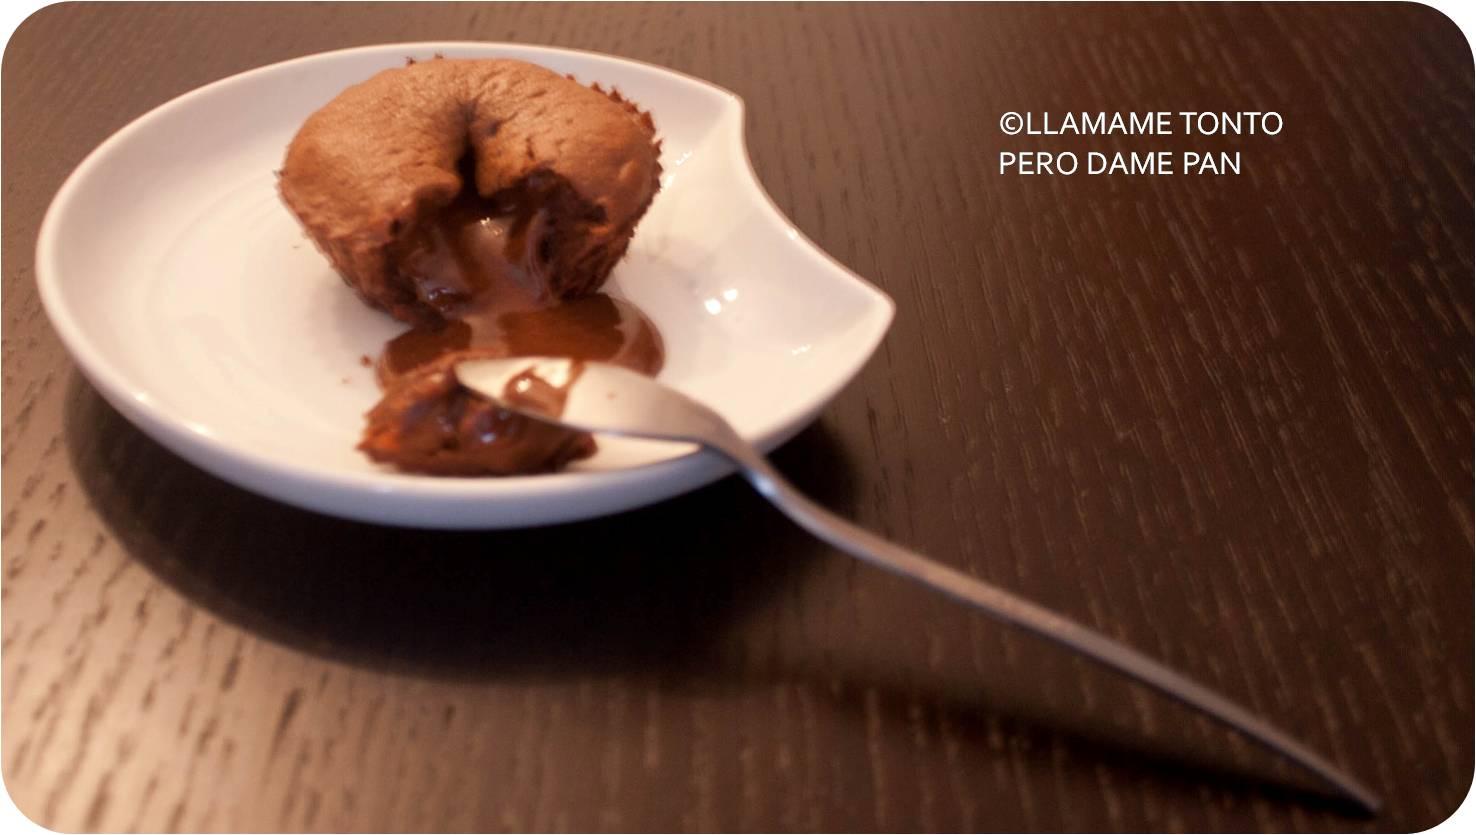 http://llamametontoperodamepan.blogspot.com.es/2013/10/coulant-o-volcan-de-chocolate.html